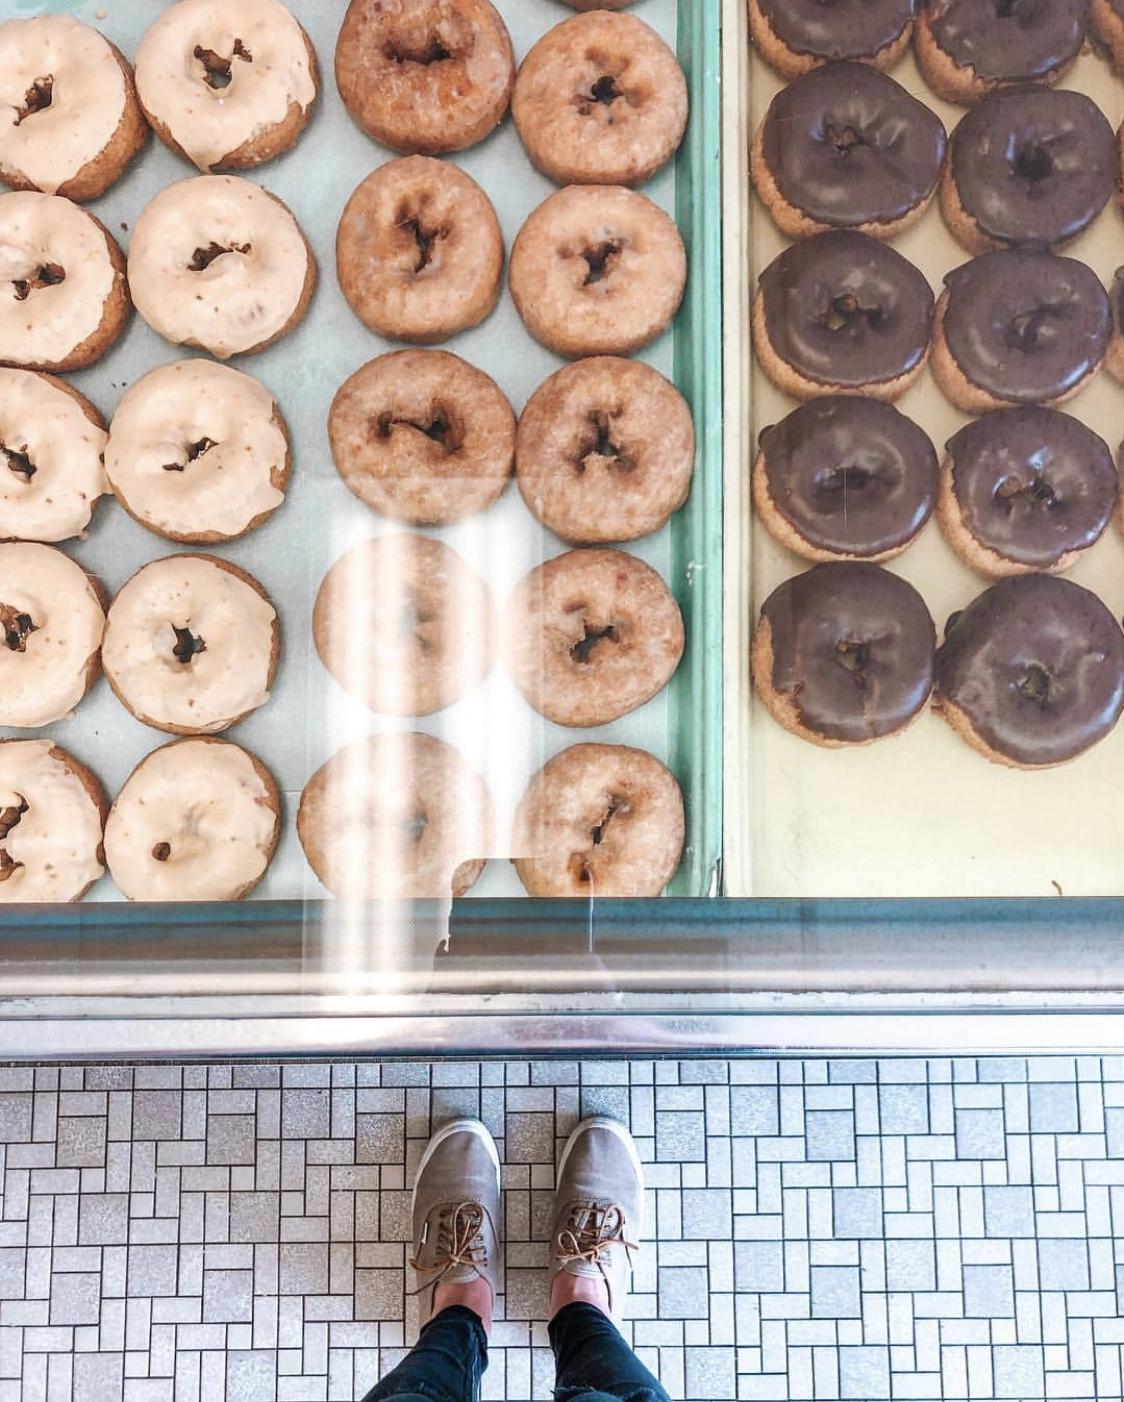 donuts bakery bakedgoods grandville grand rapids michigan iheartgr iheartgrandrapids